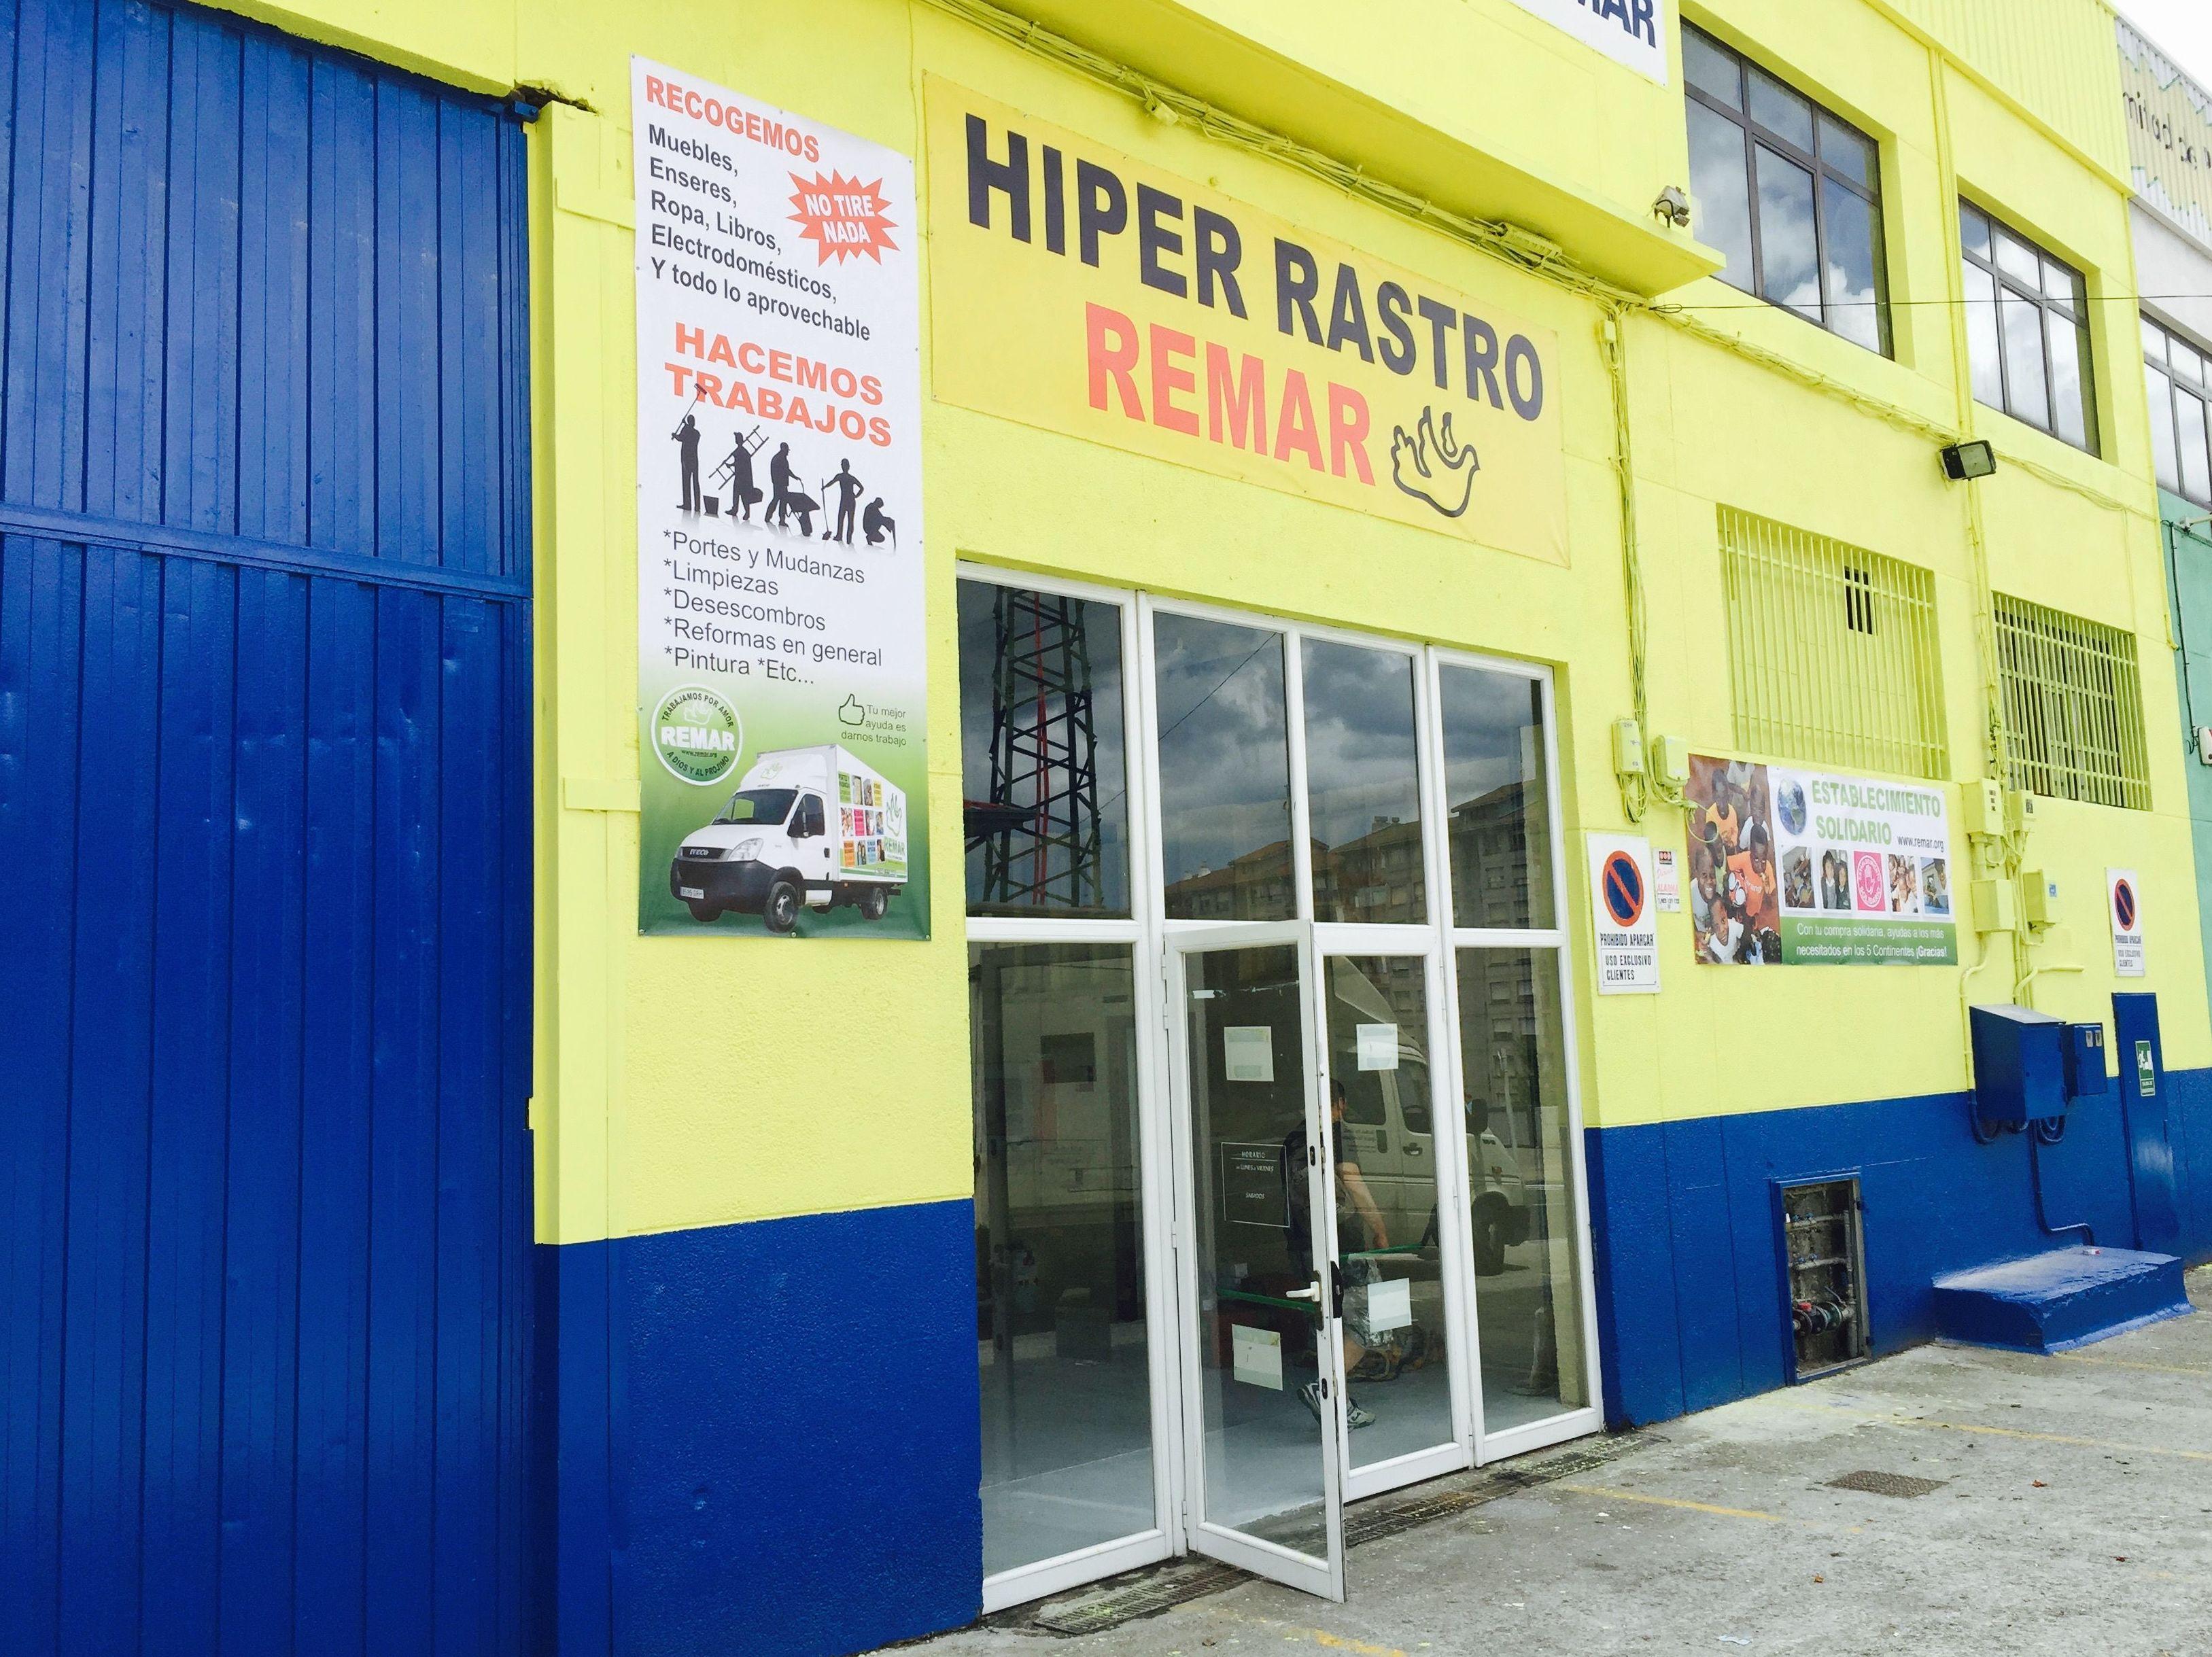 HIPER RASTRO REMAR EN IRUN